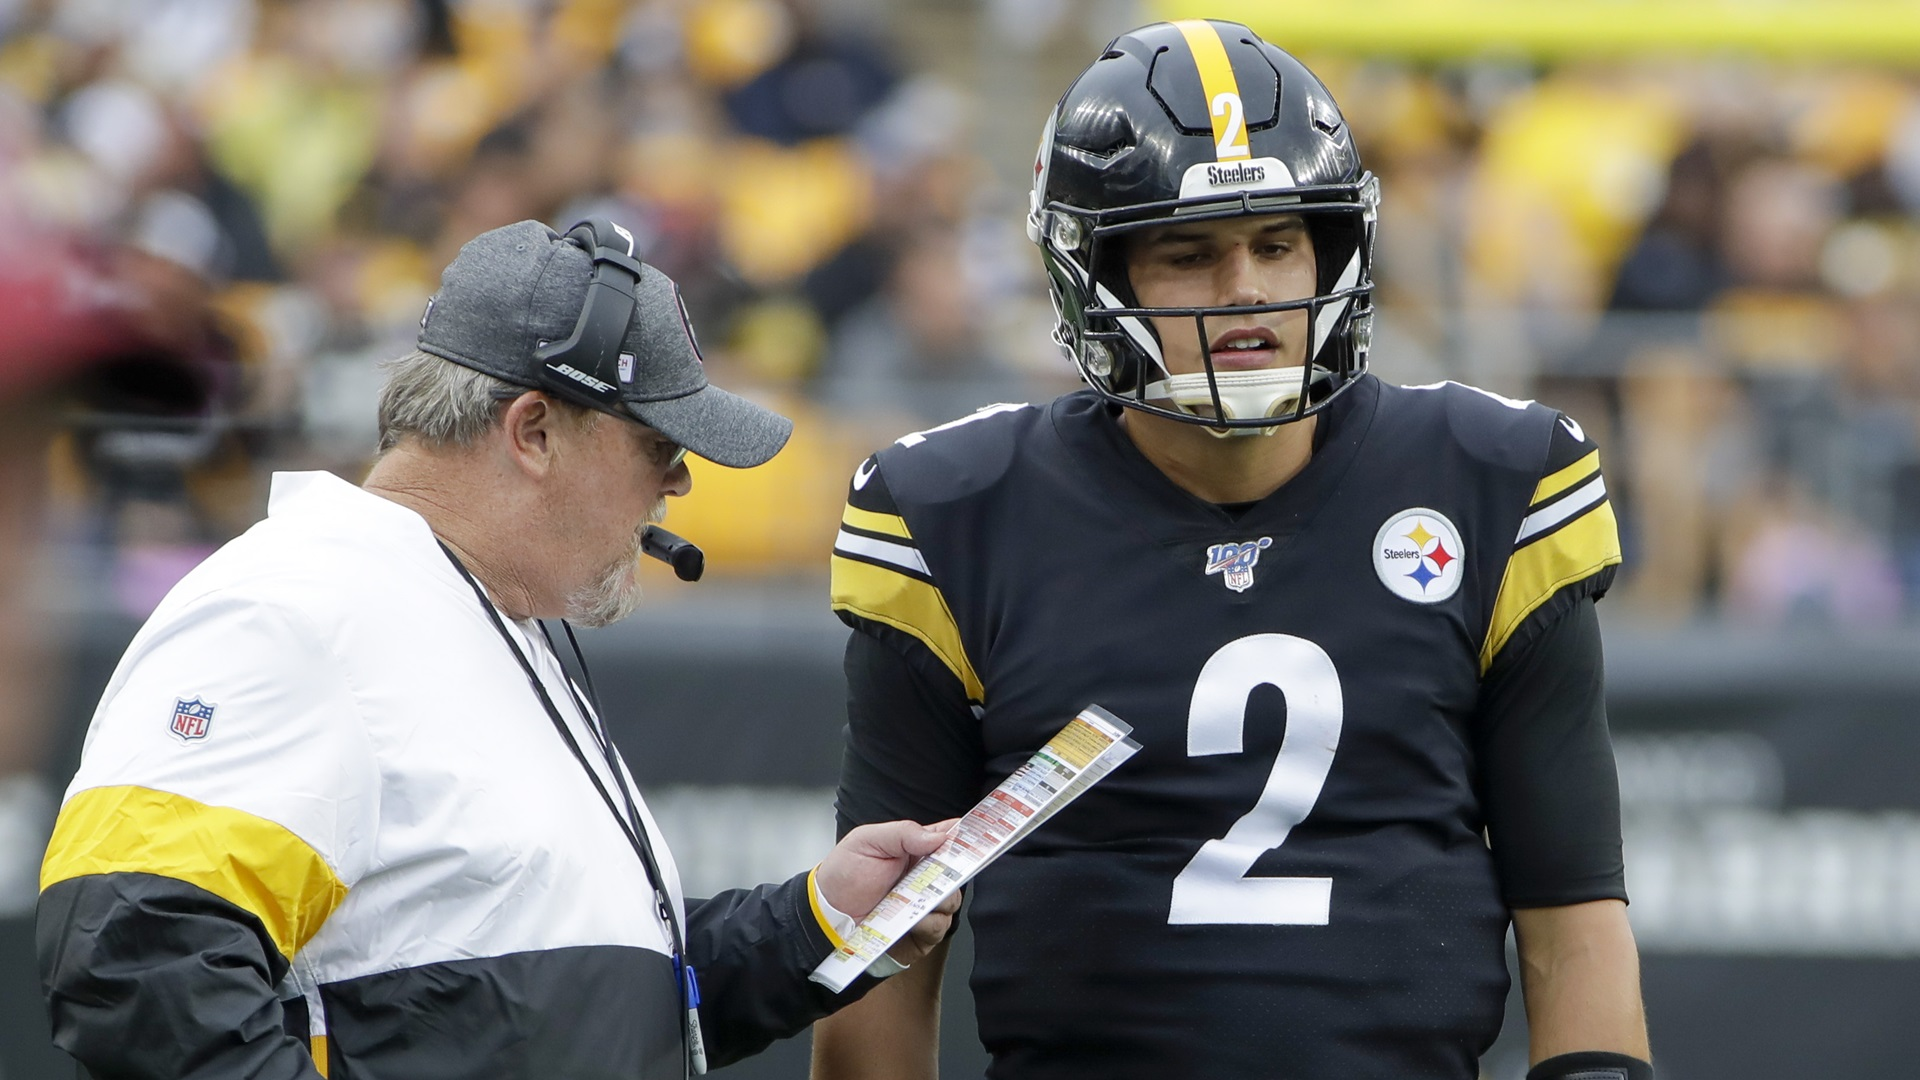 Steelers Qb Mason Rudolph Remains In Concussion Protocol Abc27